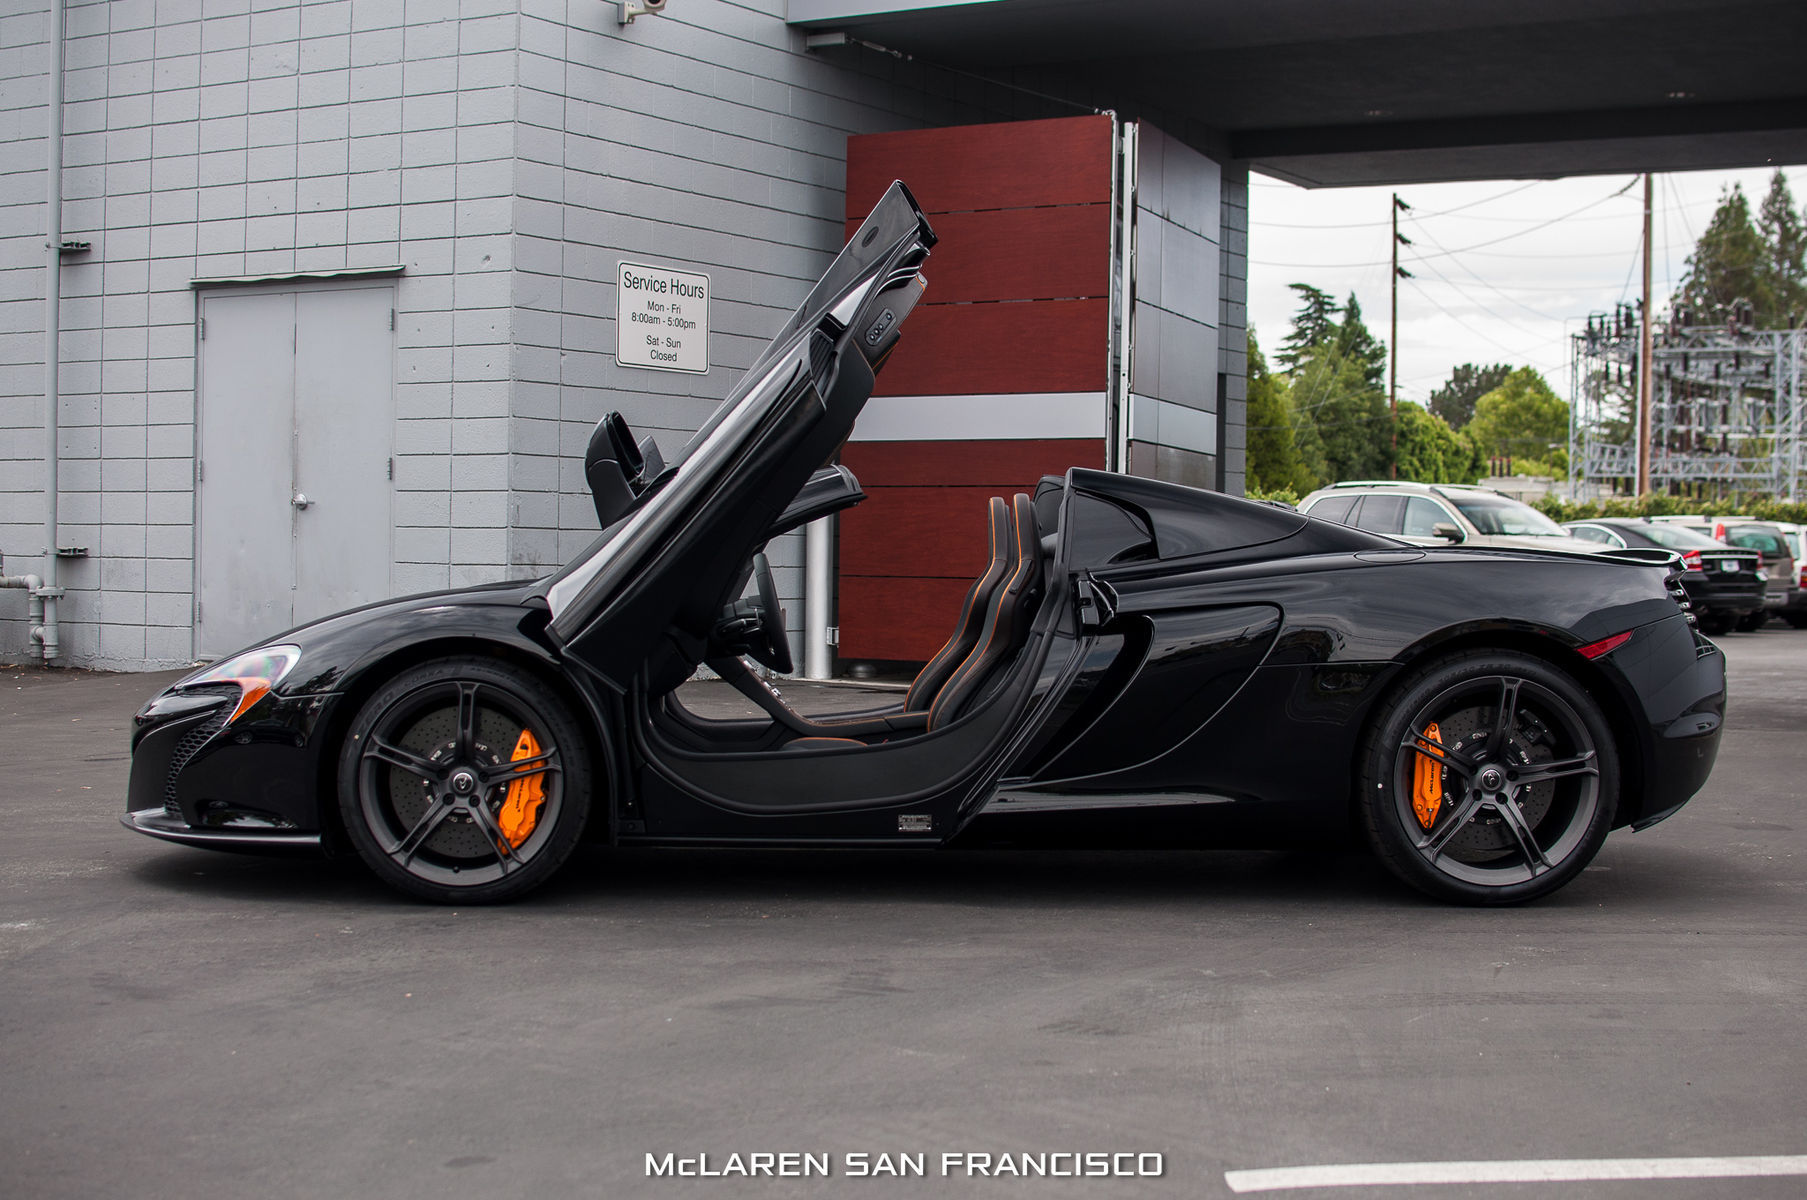 2014 McLaren MP4-12C Spider | 650S 12C Spider 4098